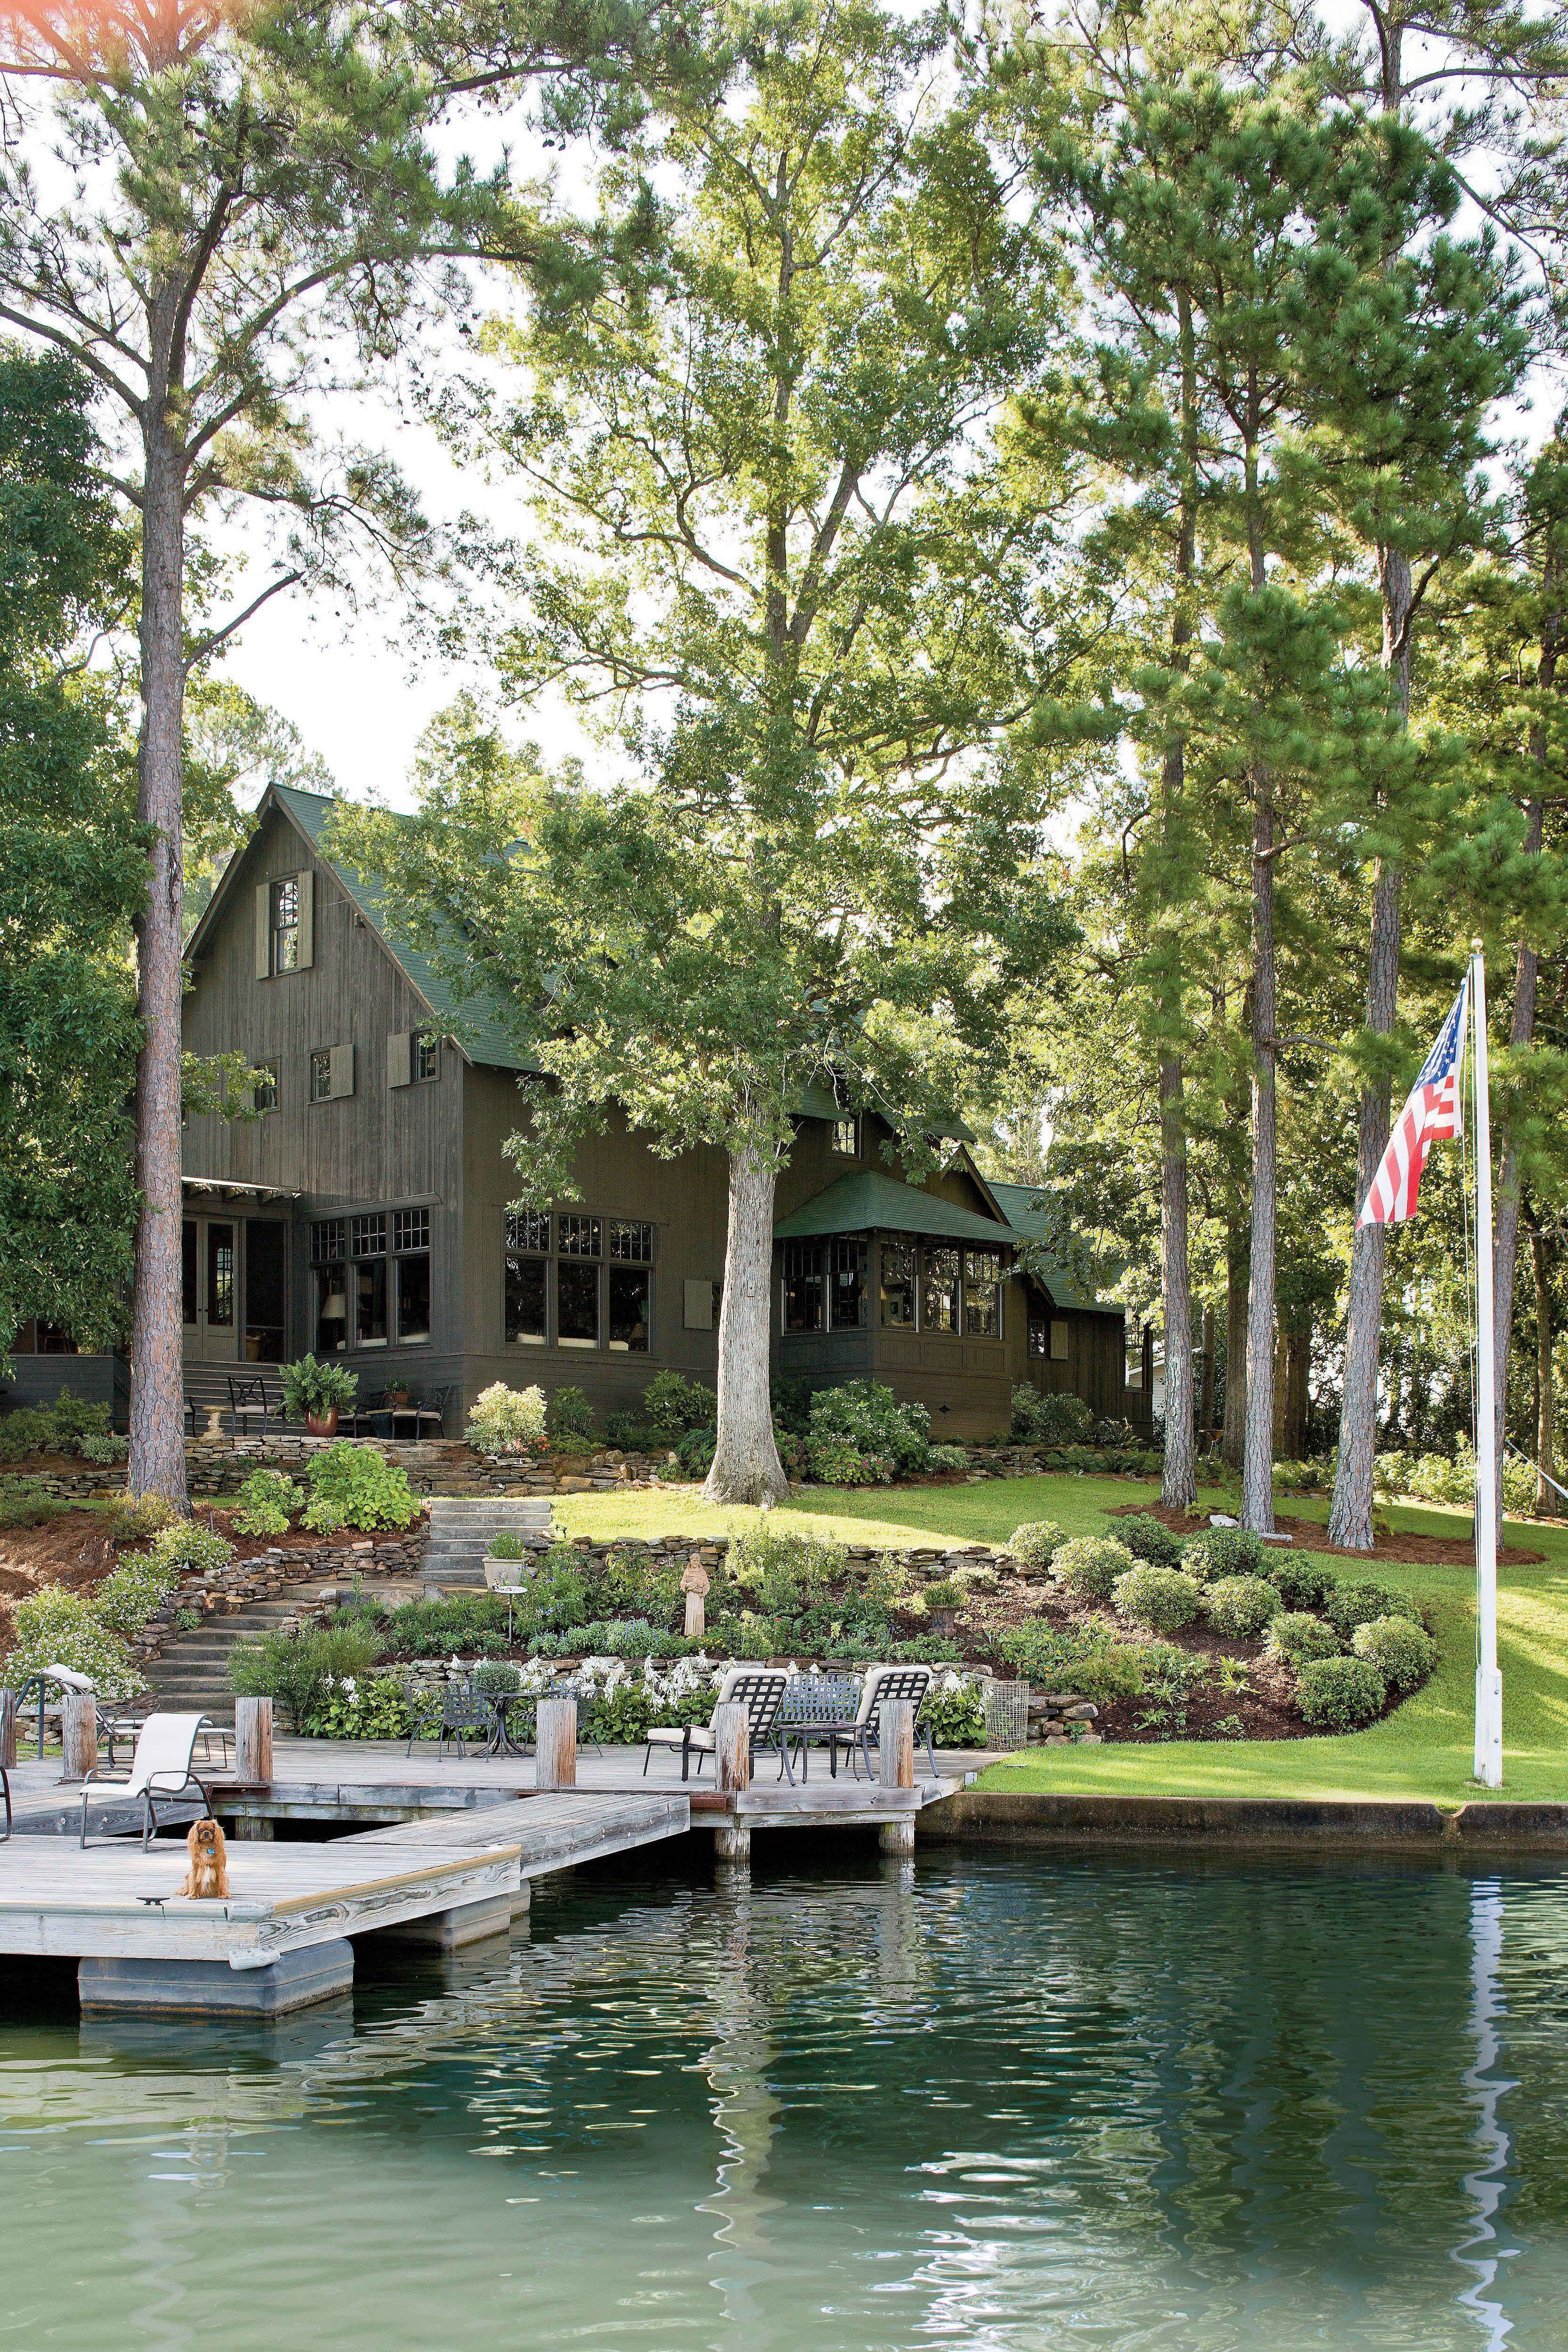 natural lake house art modern lake house lake cabins. Black Bedroom Furniture Sets. Home Design Ideas